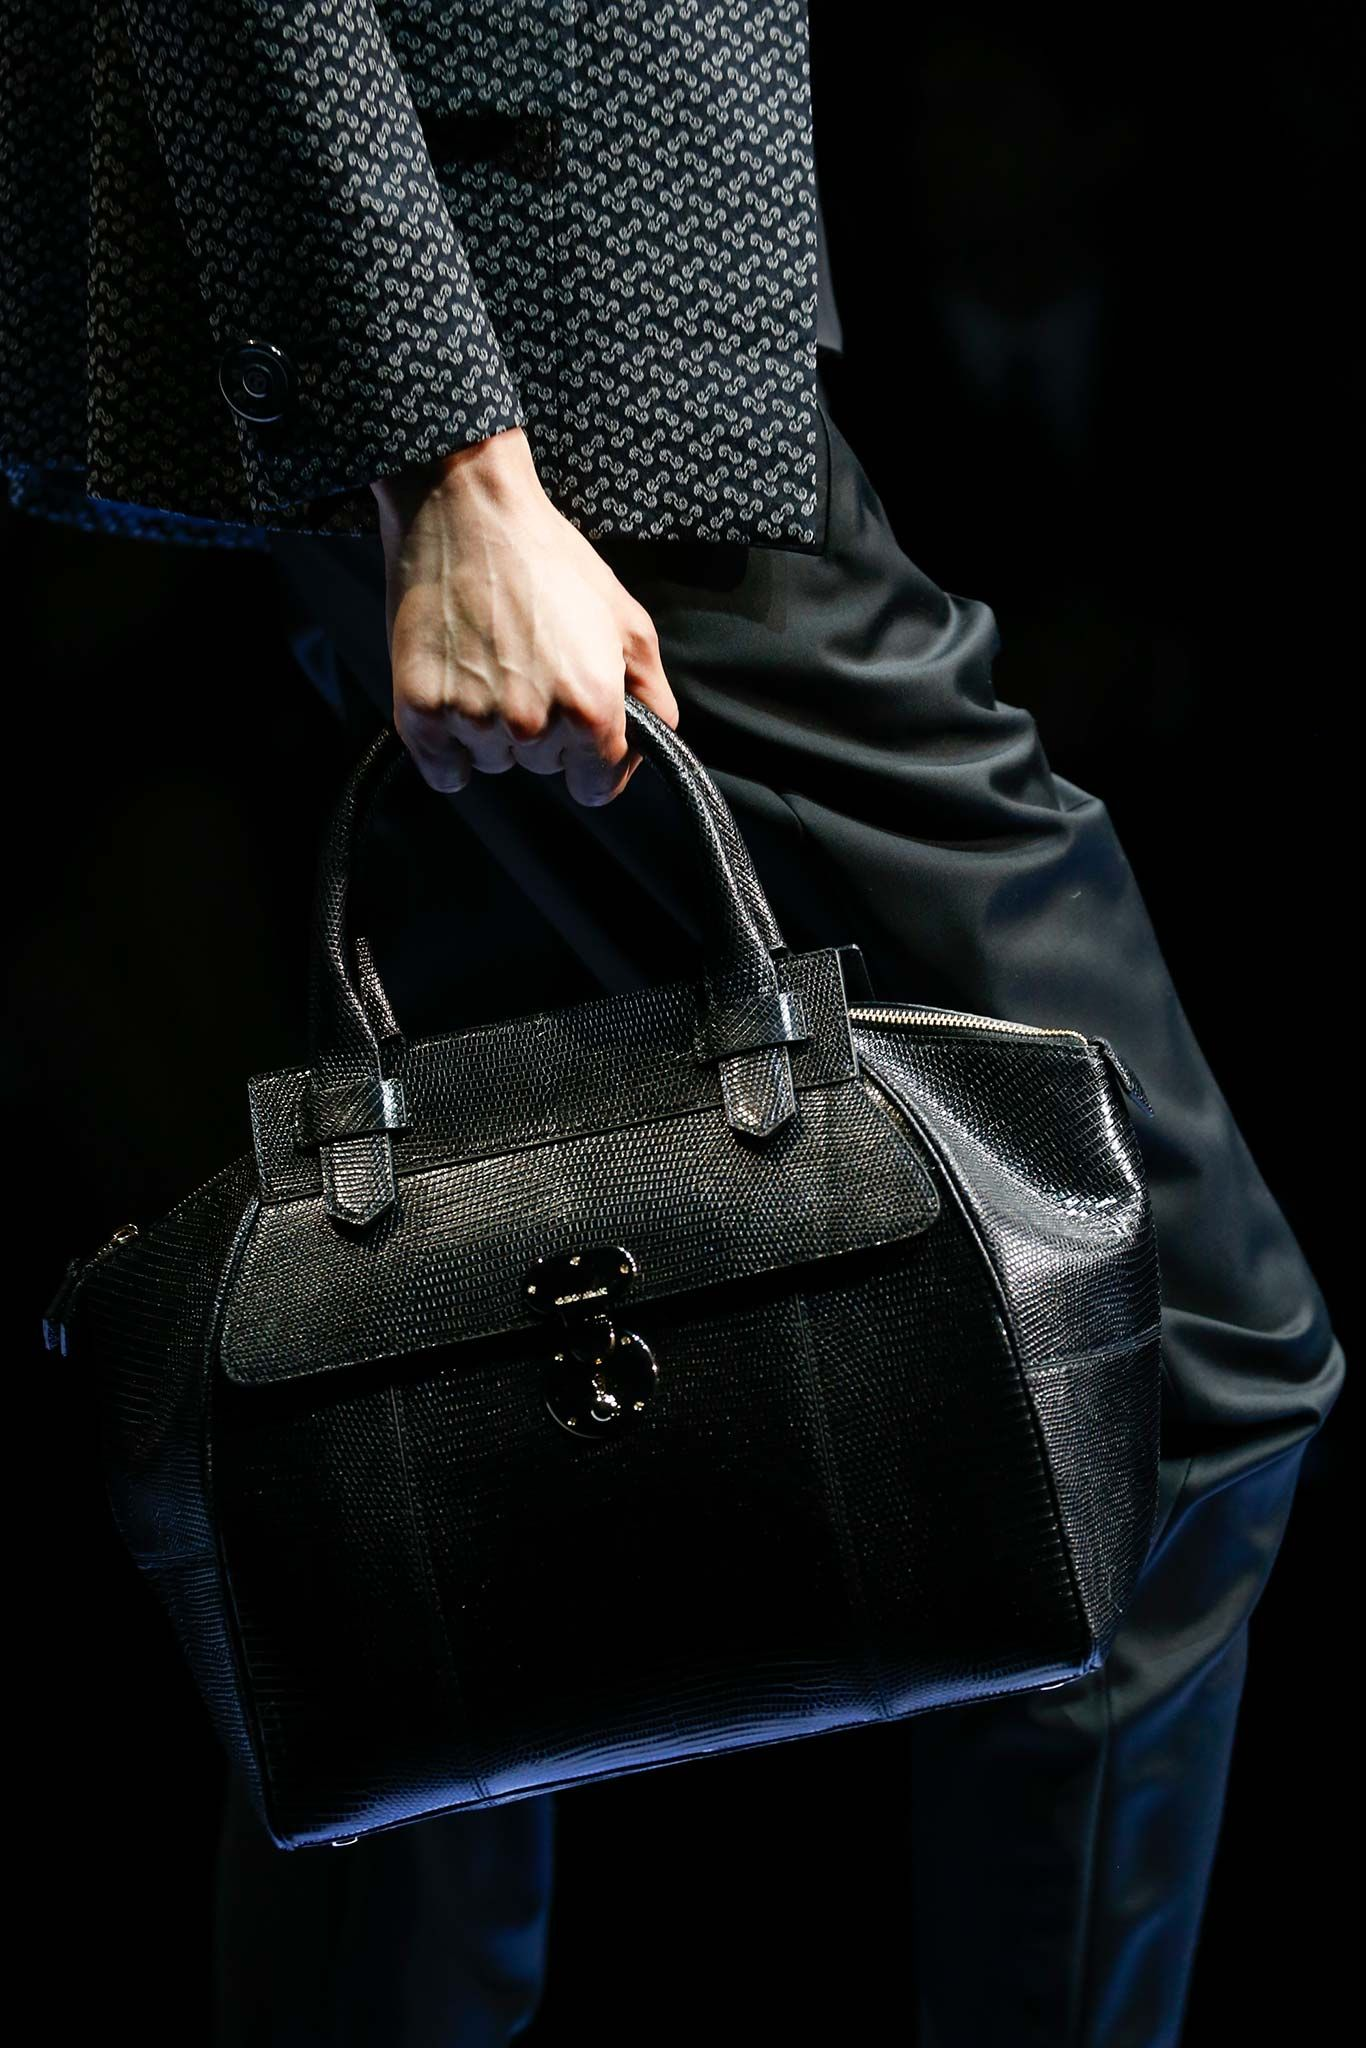 Giorgio Armani - Fall 2015 Ready-to-Wear - Look 24 of 196